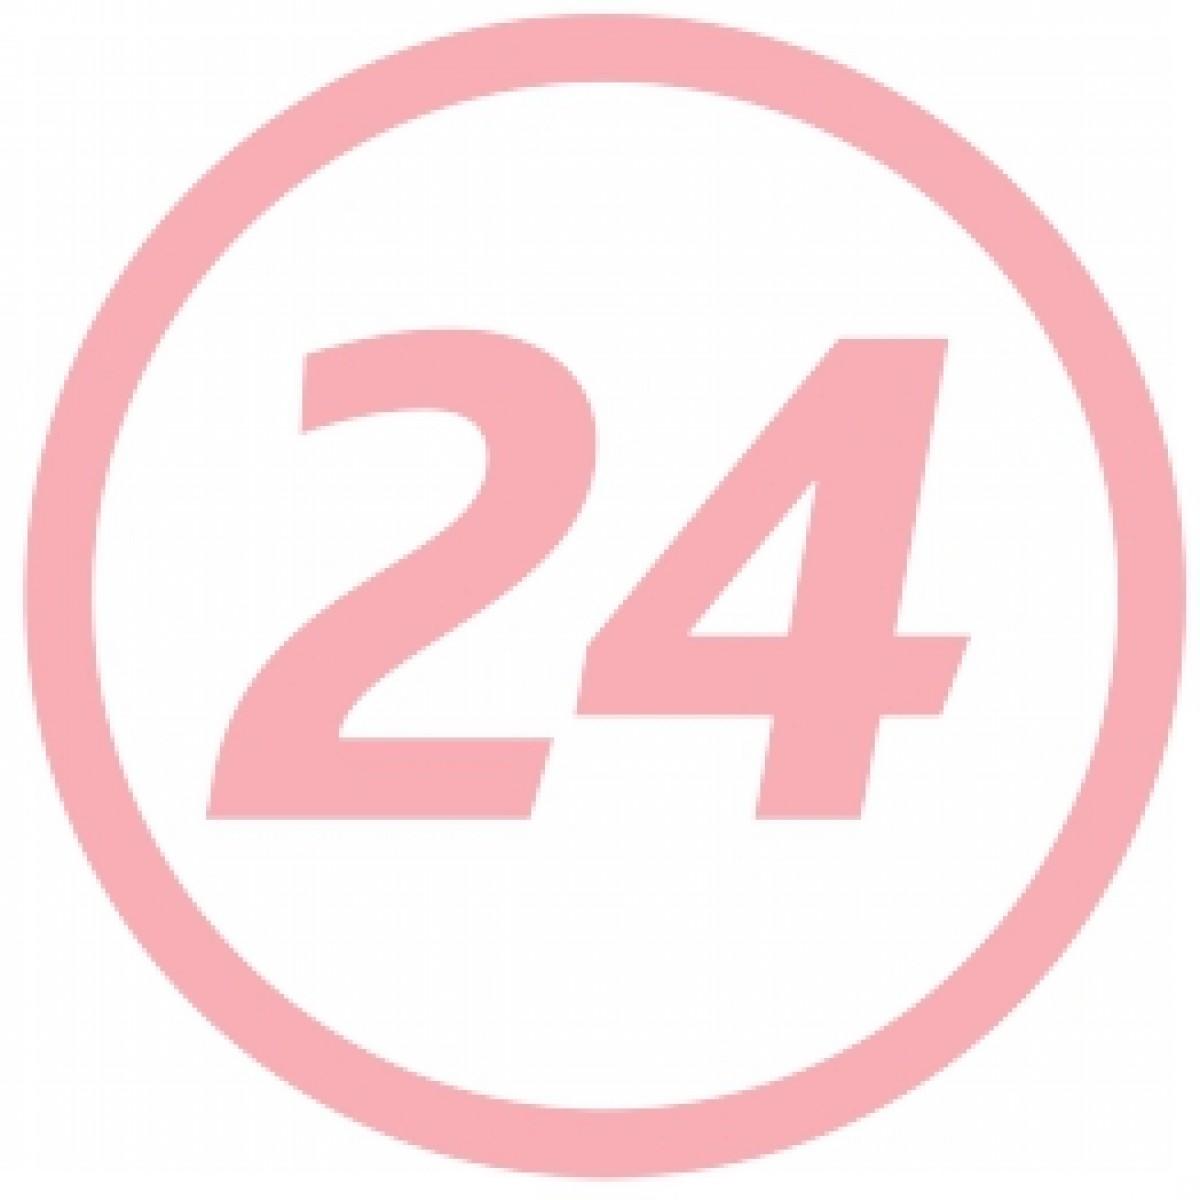 HARTMANN Peha-Taft Classic Manusi Chirurgicale Pudrate Marimea 6, 6 1/2, 7, 7 1/2, 8, 8 1/2, Latex, Manusi, 50buc